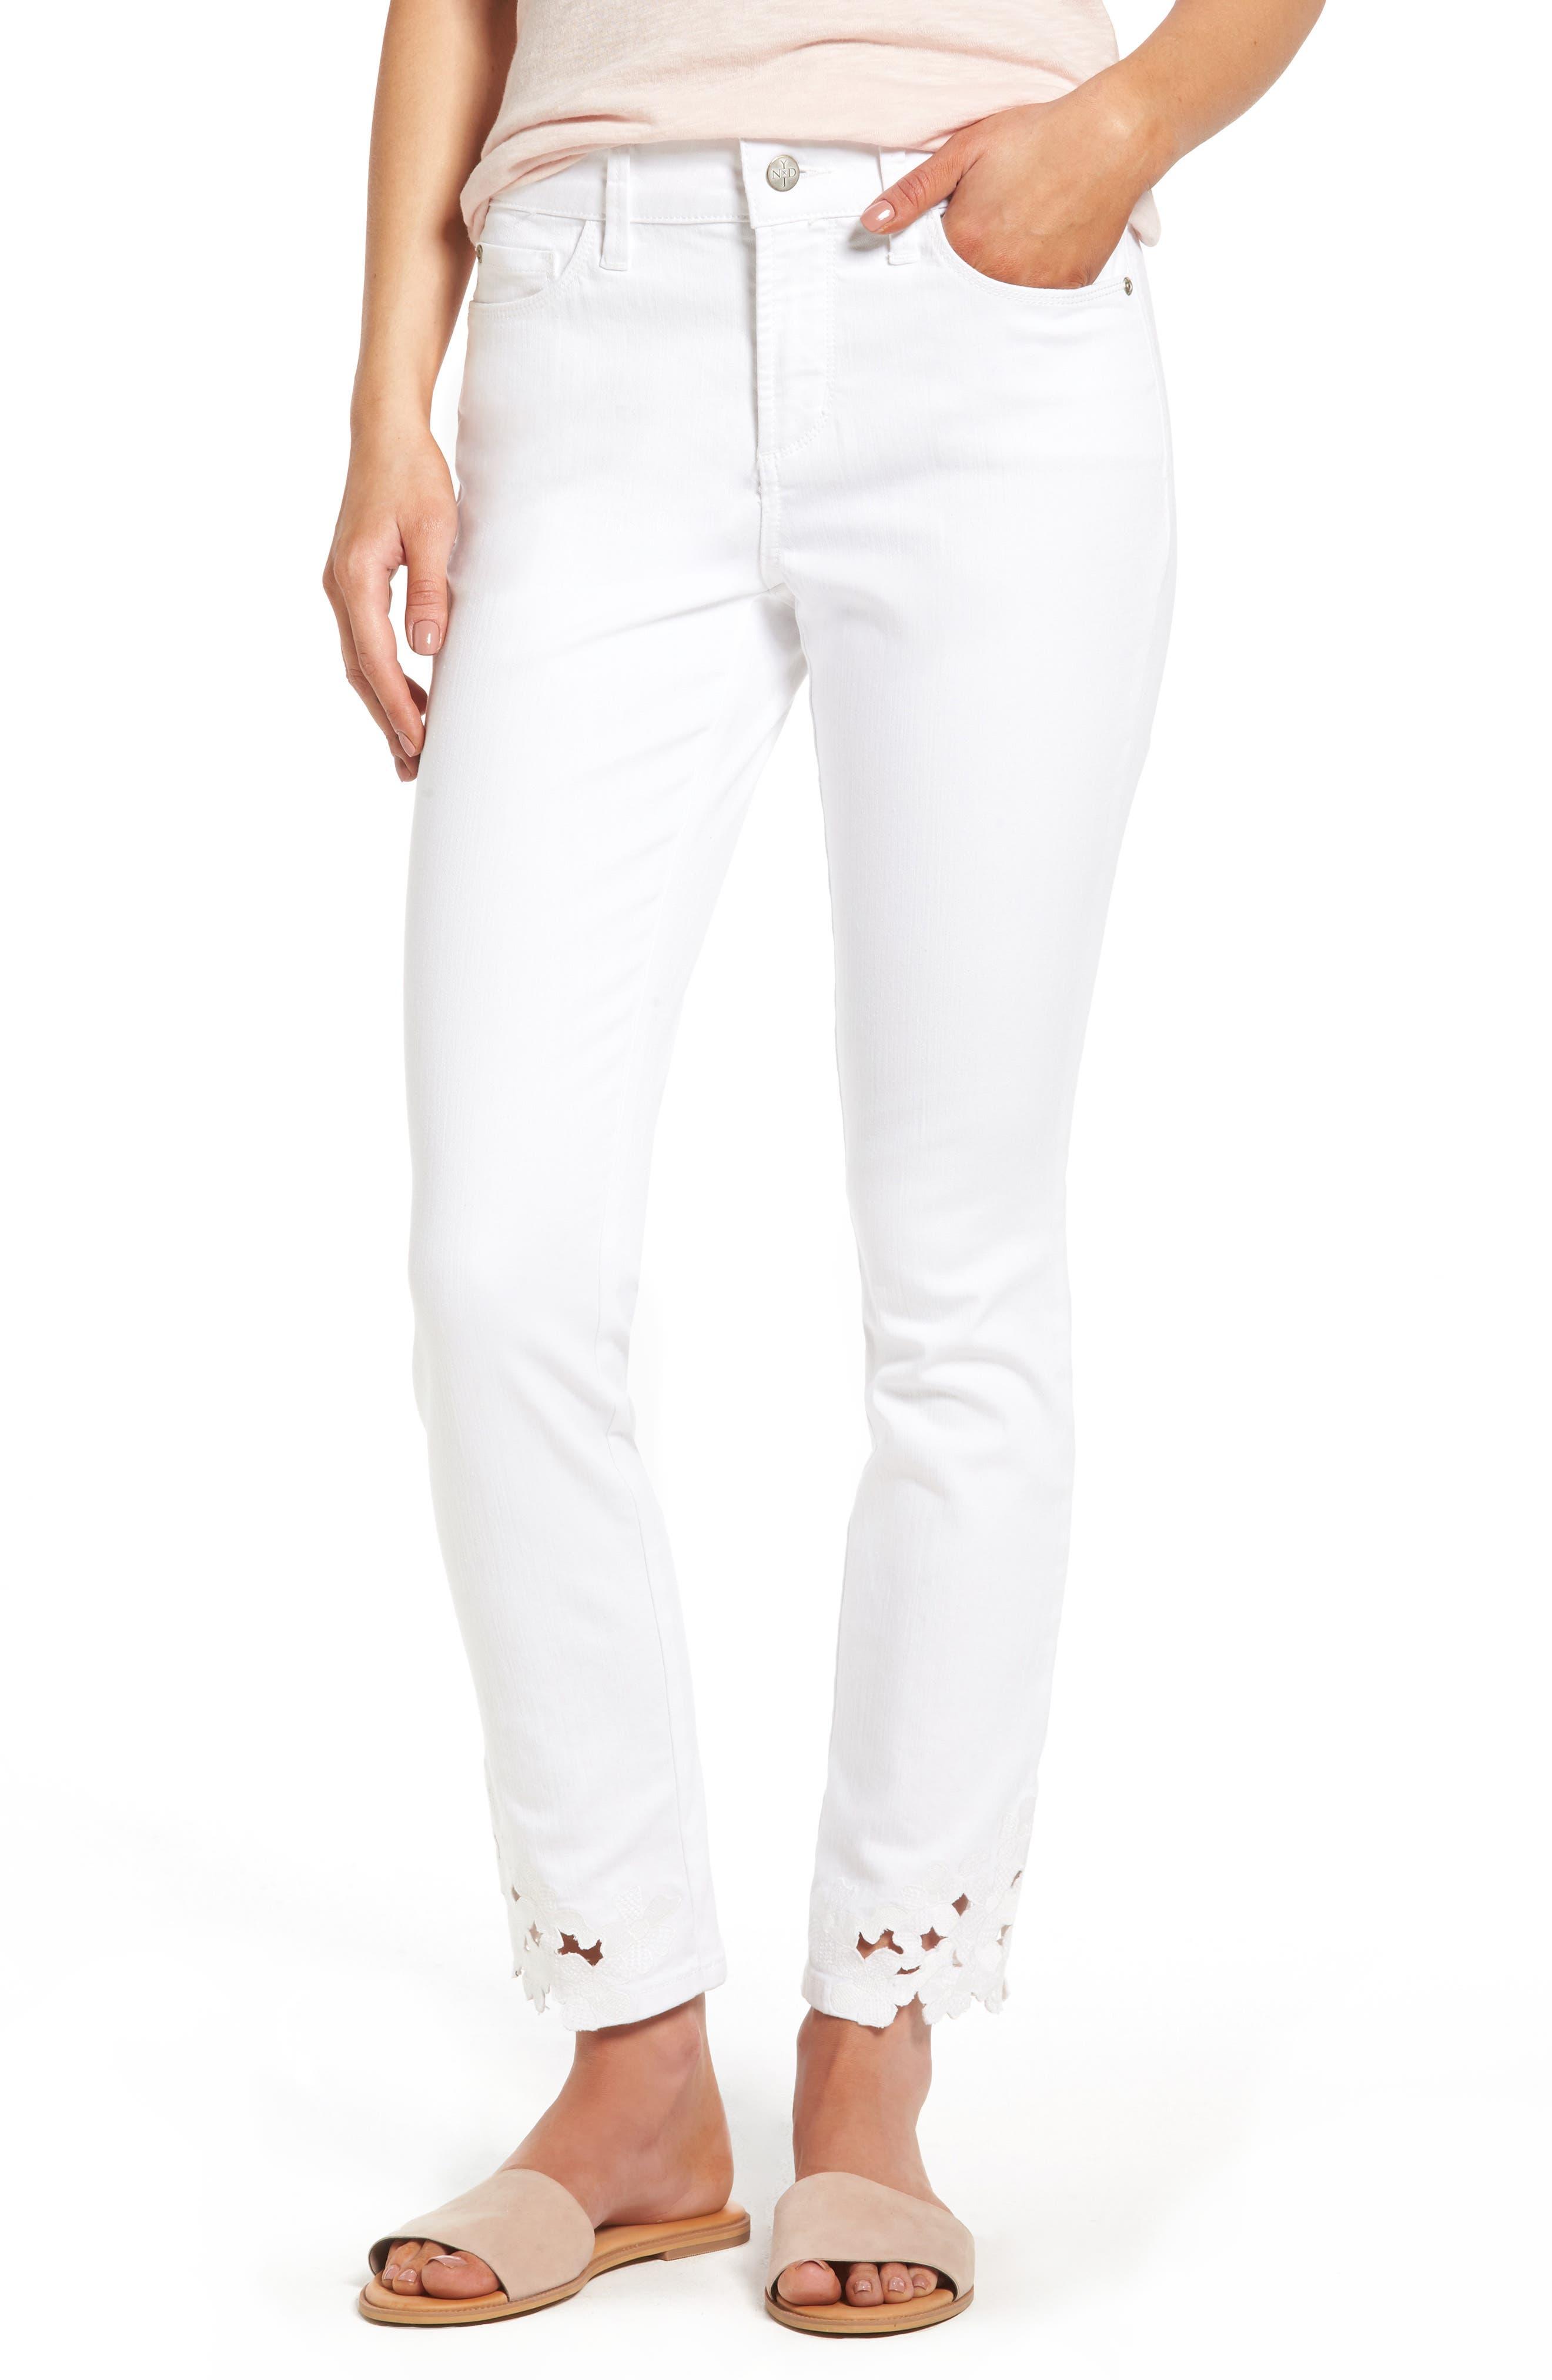 Alternate Image 1 Selected - NYDJ Alina Eyelet Hem Stretch Skinny Jeans (Optic White) (Regular & Petite)